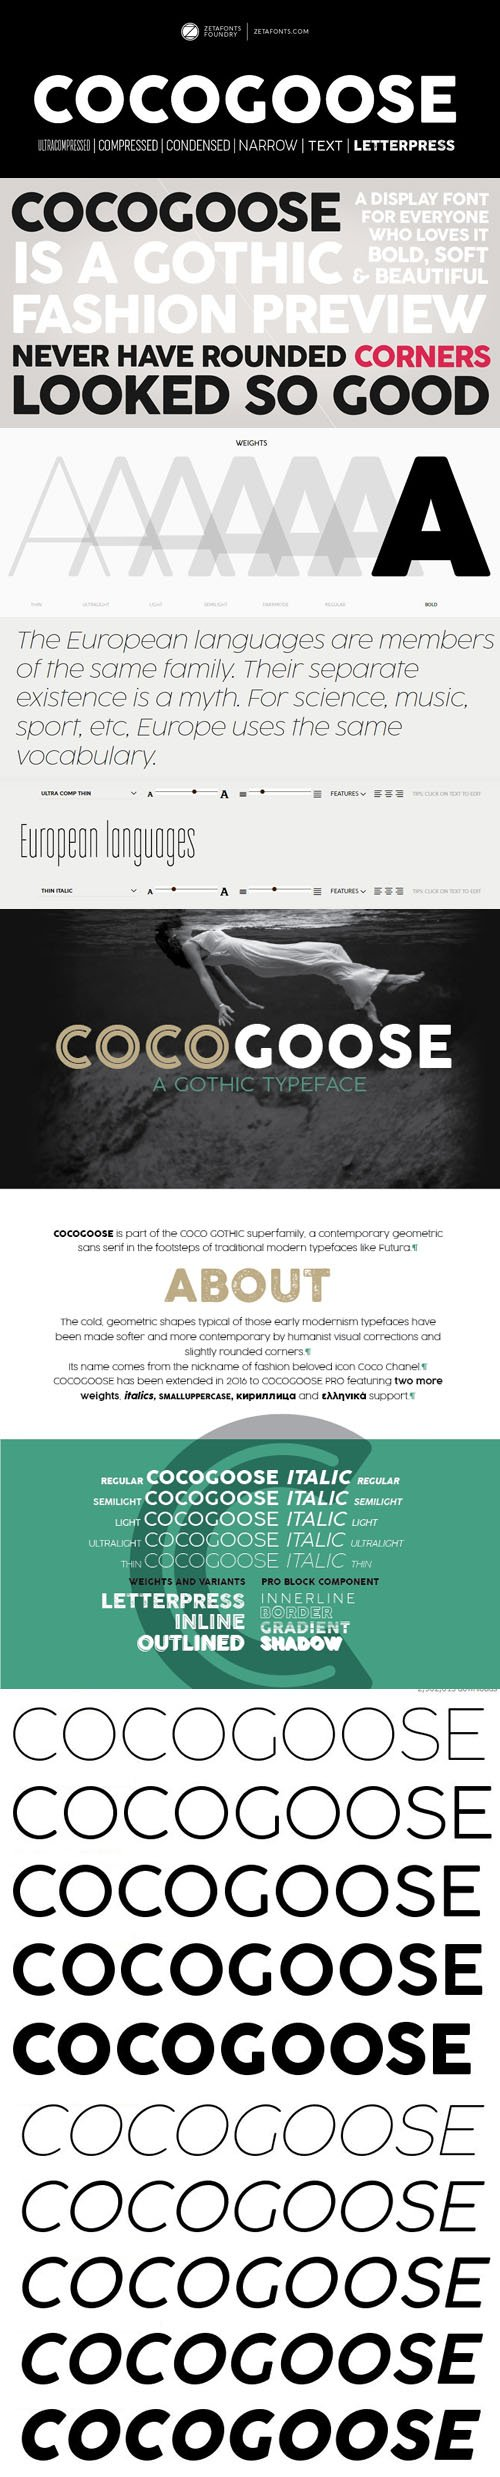 Cocogoose Sans Serif Typeface [10-Weights]